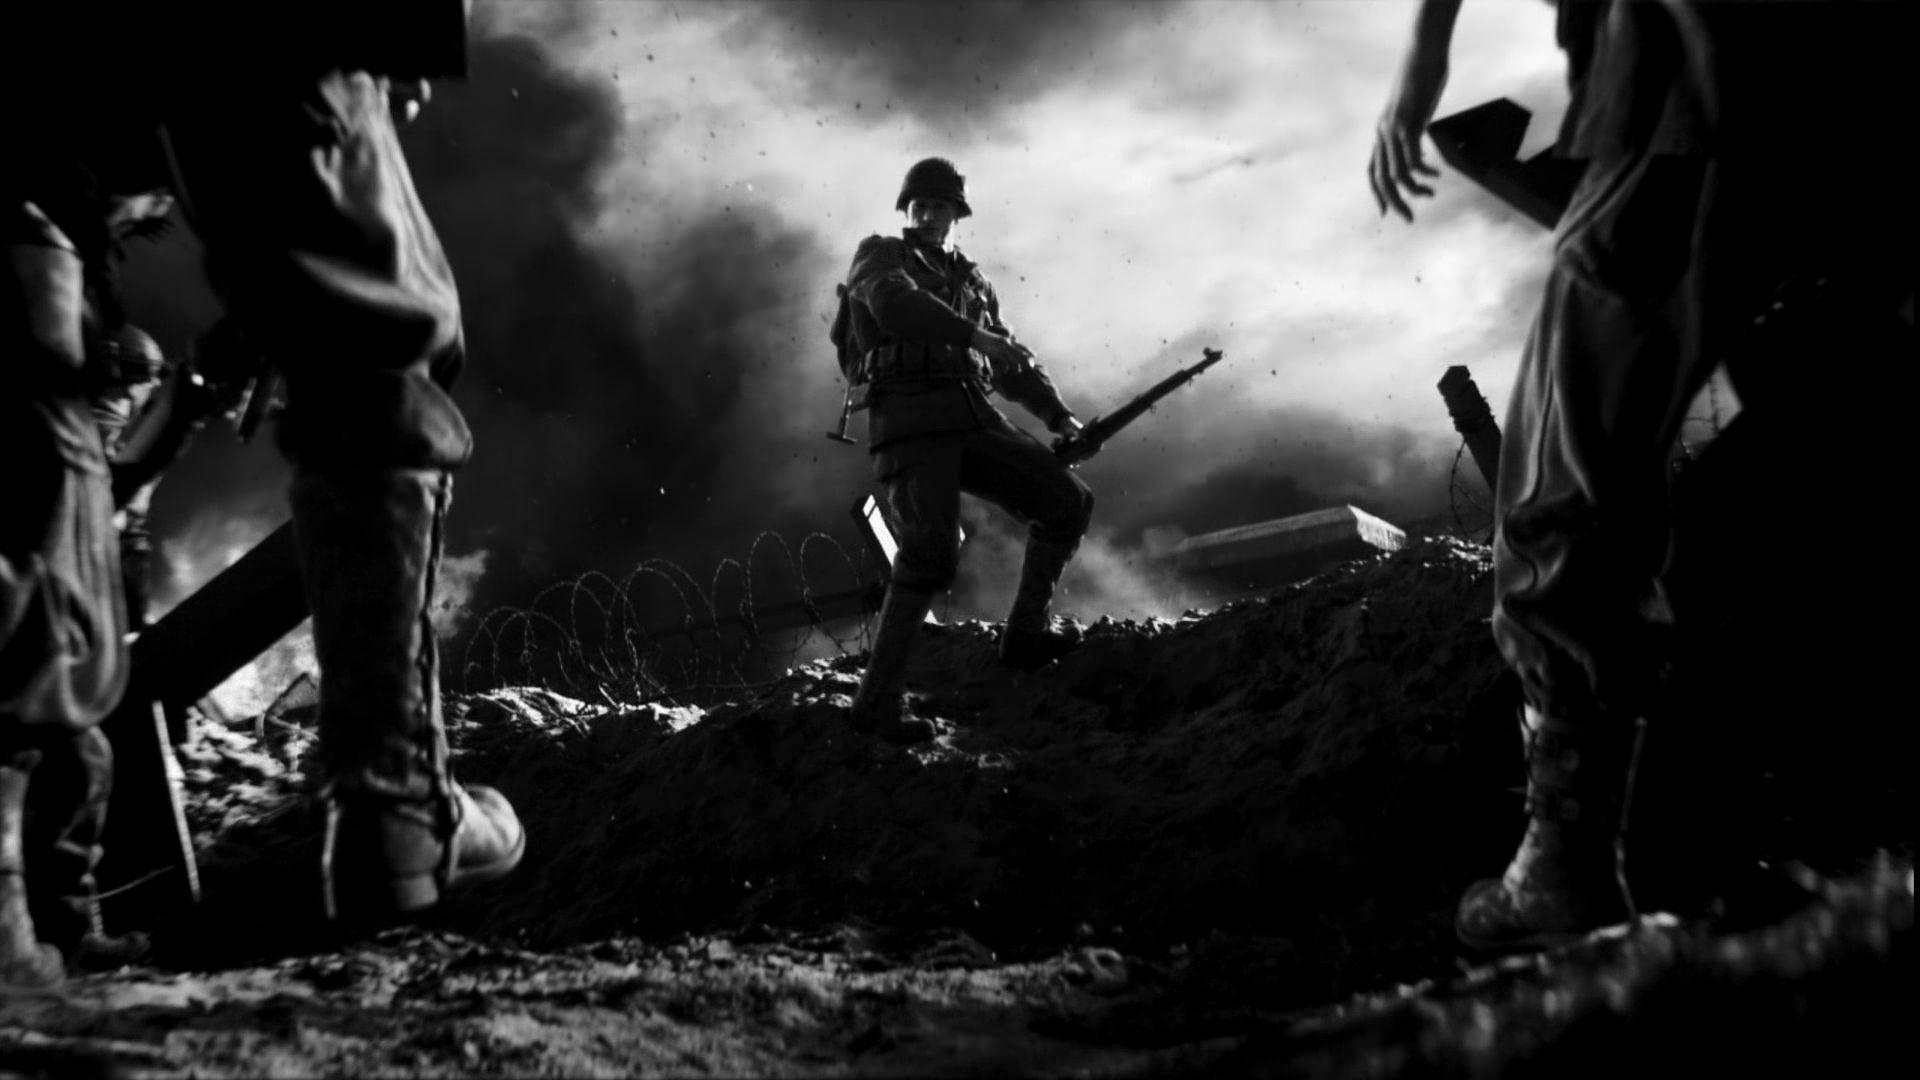 Call Of Duty Wallpaper Wwii 1920x1080 Wallpaper Teahub Io